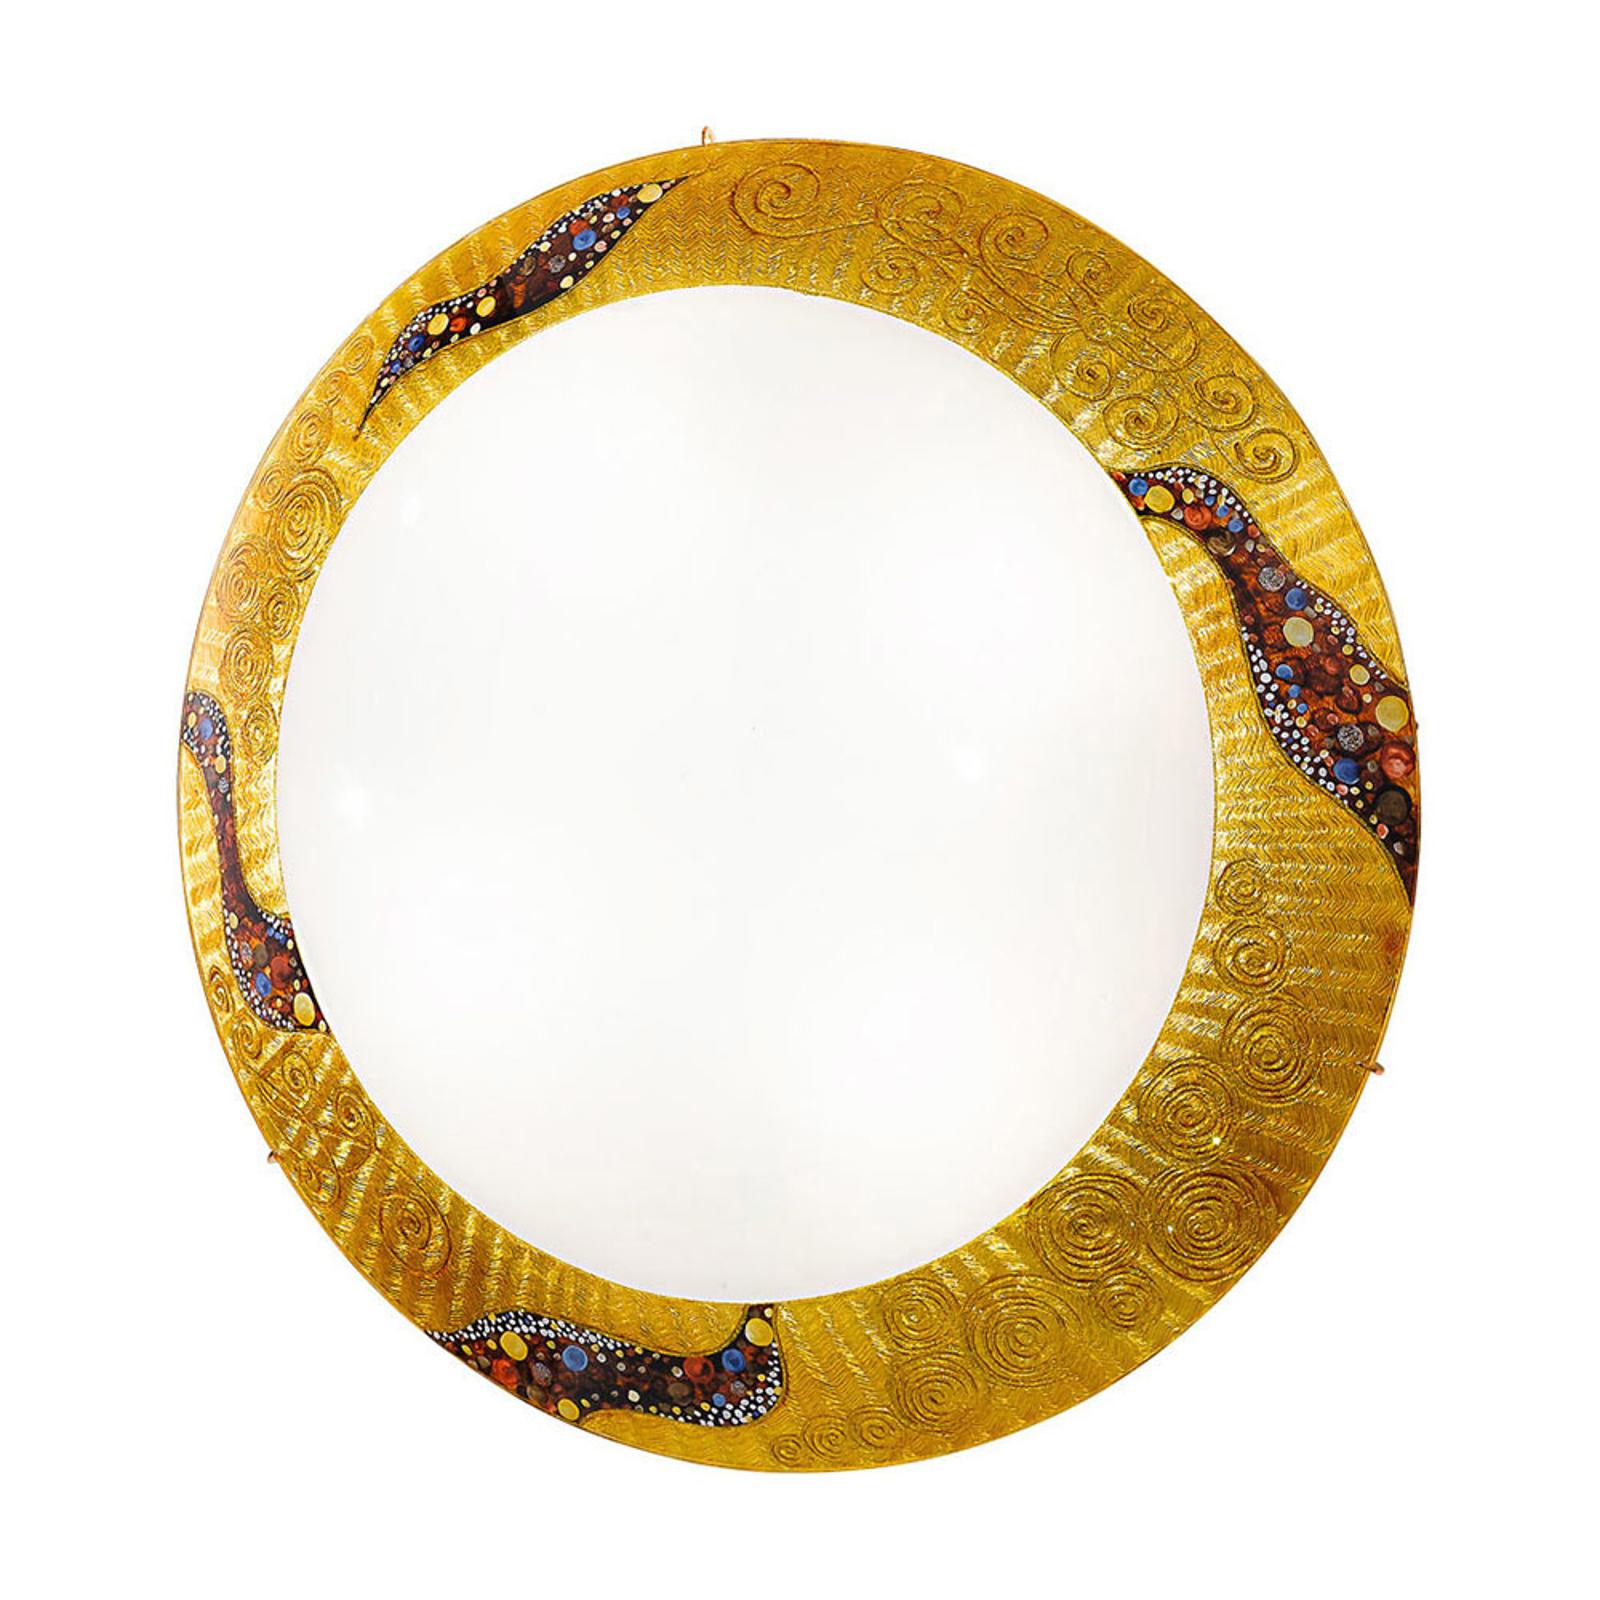 KOLARZ Serena Kiss Gold Wandleuchte 24 kt, Ø 40 cm